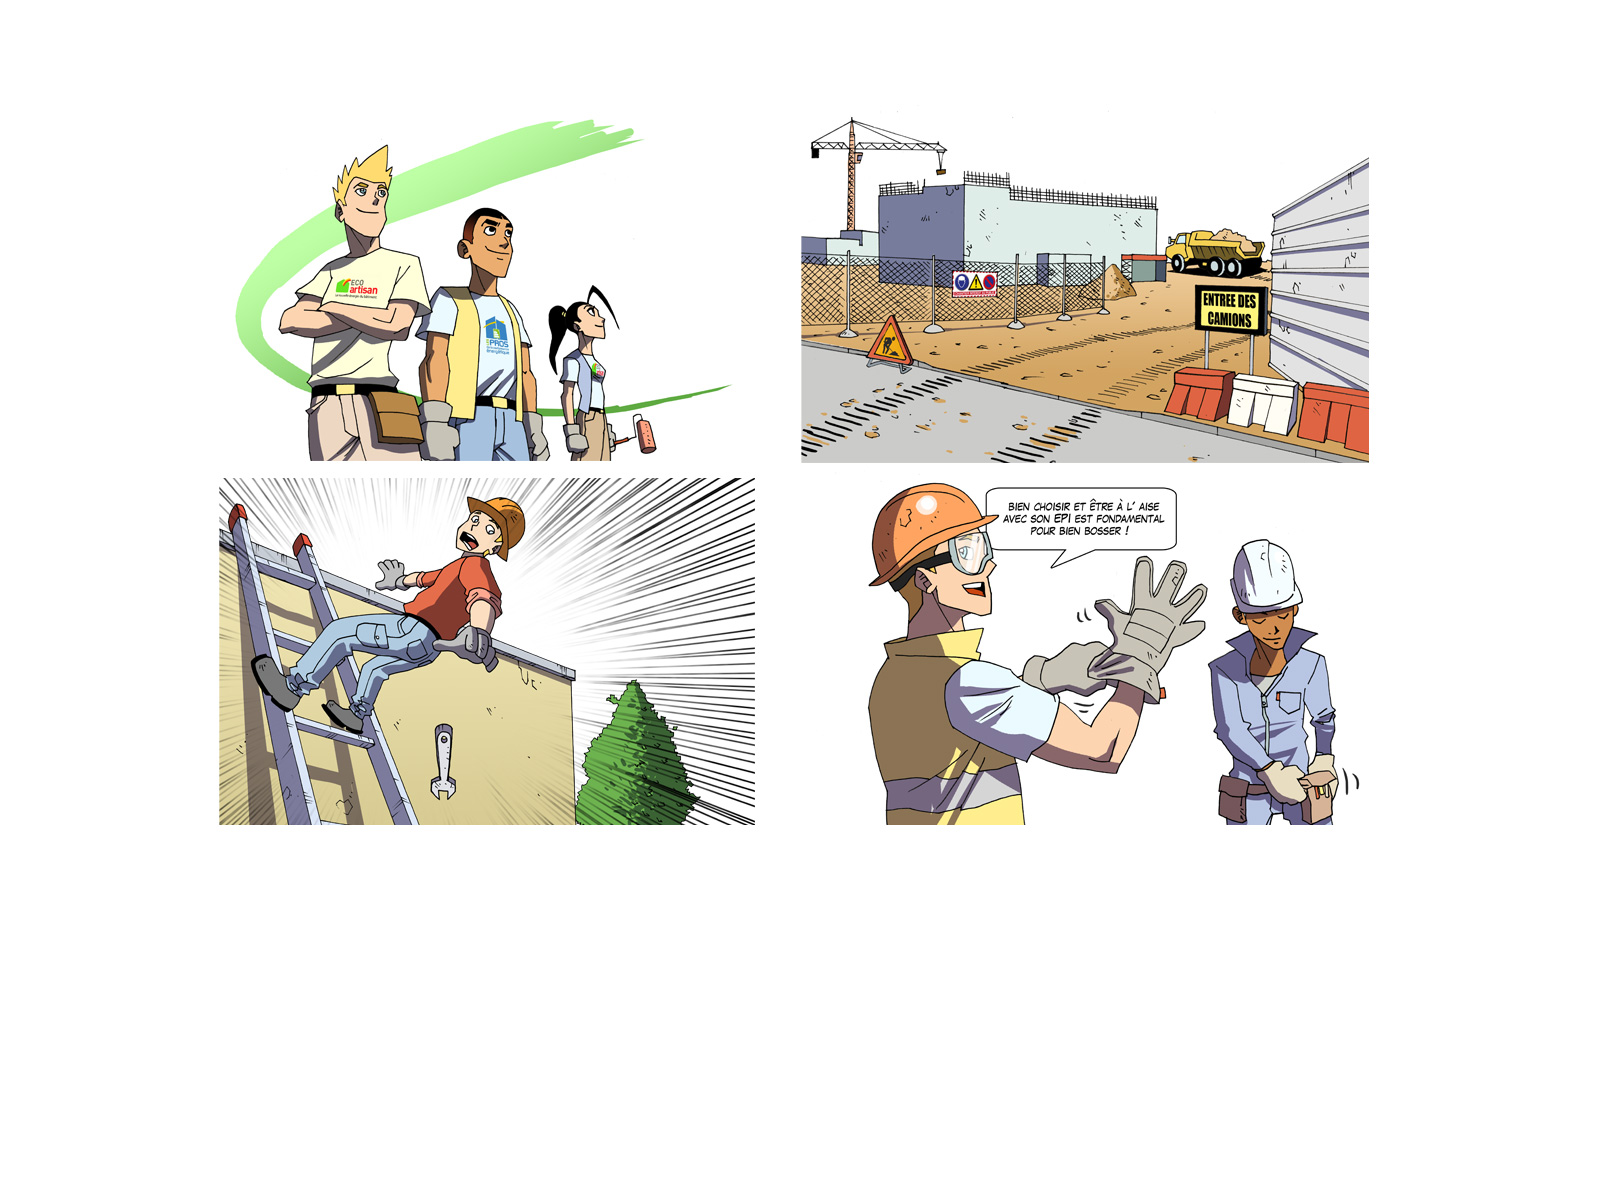 RECIOAlfonso-Illustrations-EDITIONS-3966